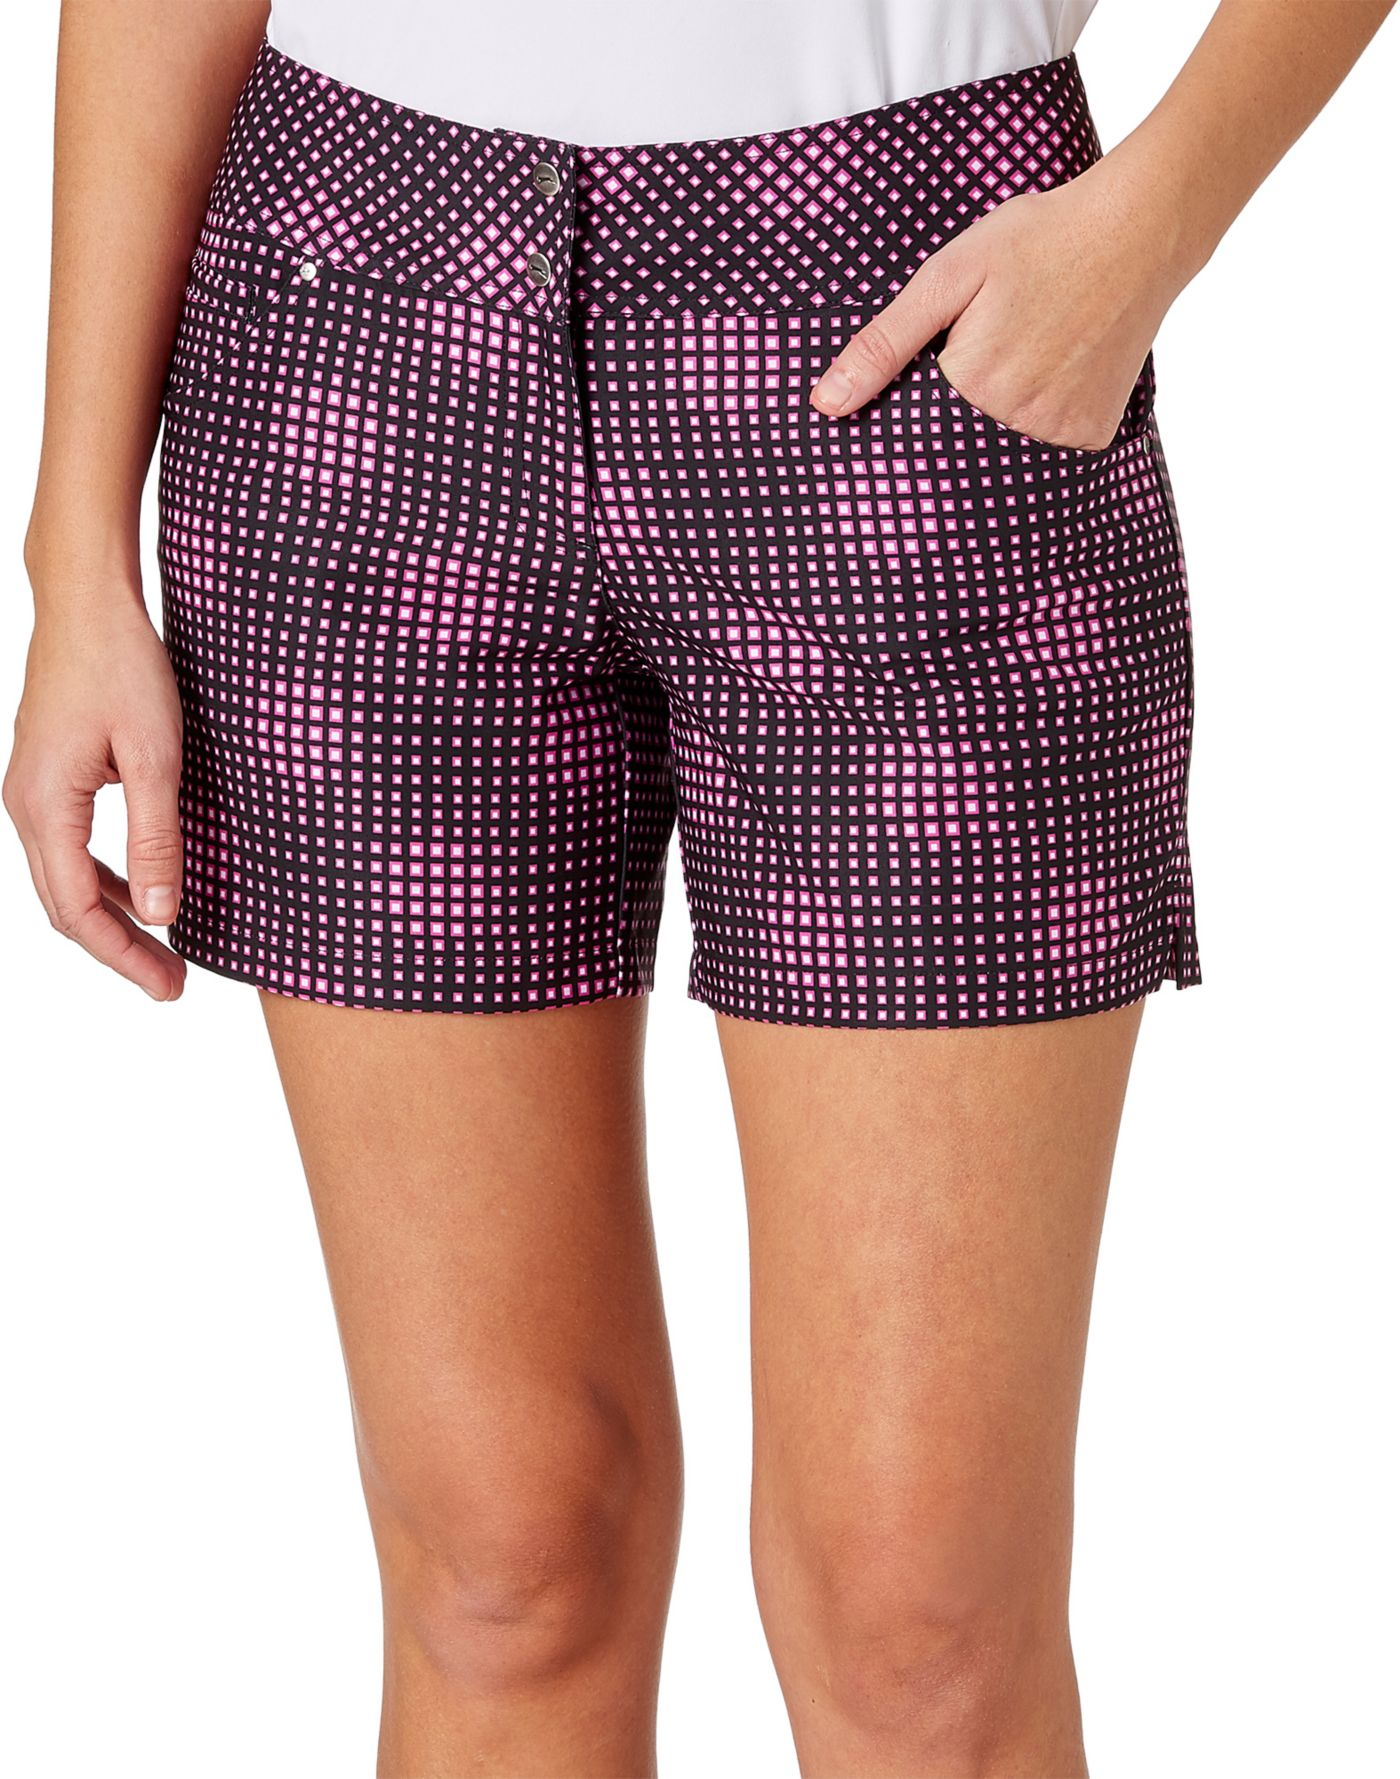 Slazenger Women's Lite Bright Collection Printed Golf Shorts